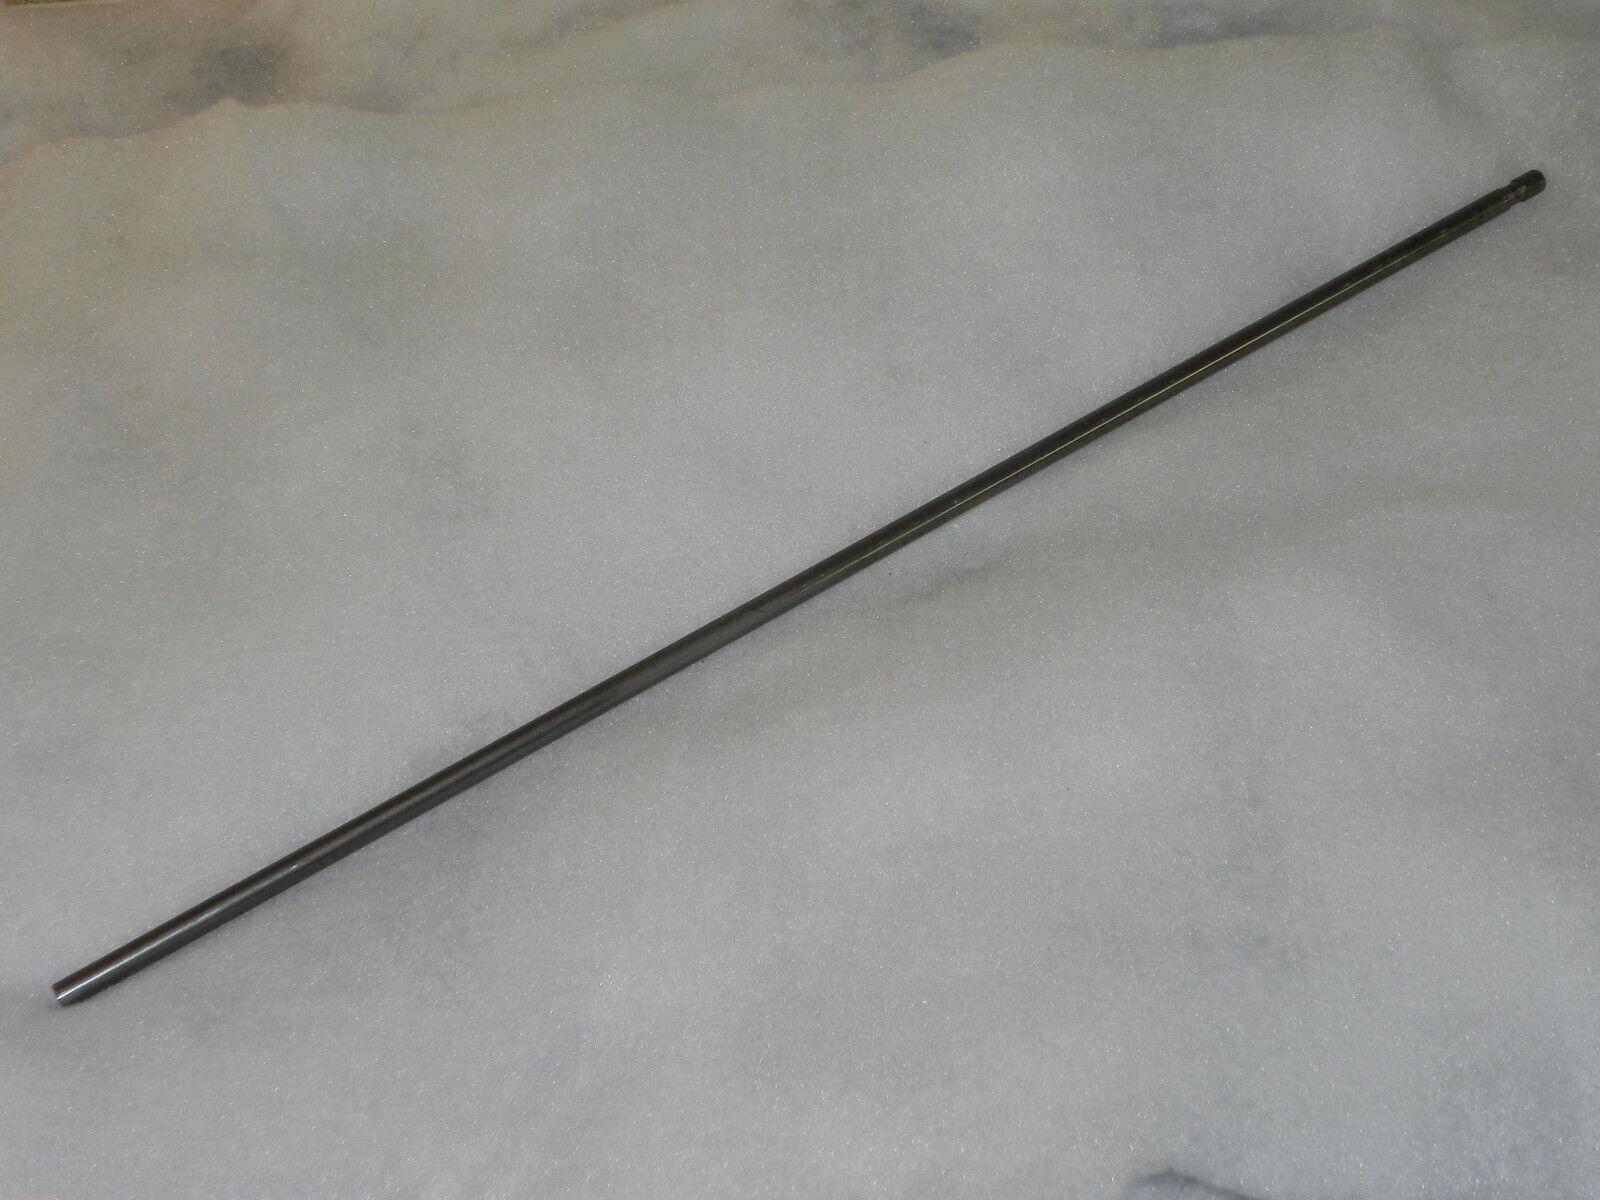 Crosman 1077 Rifled Steel Barrel In .177 Caliber - Genuine Fresh Part